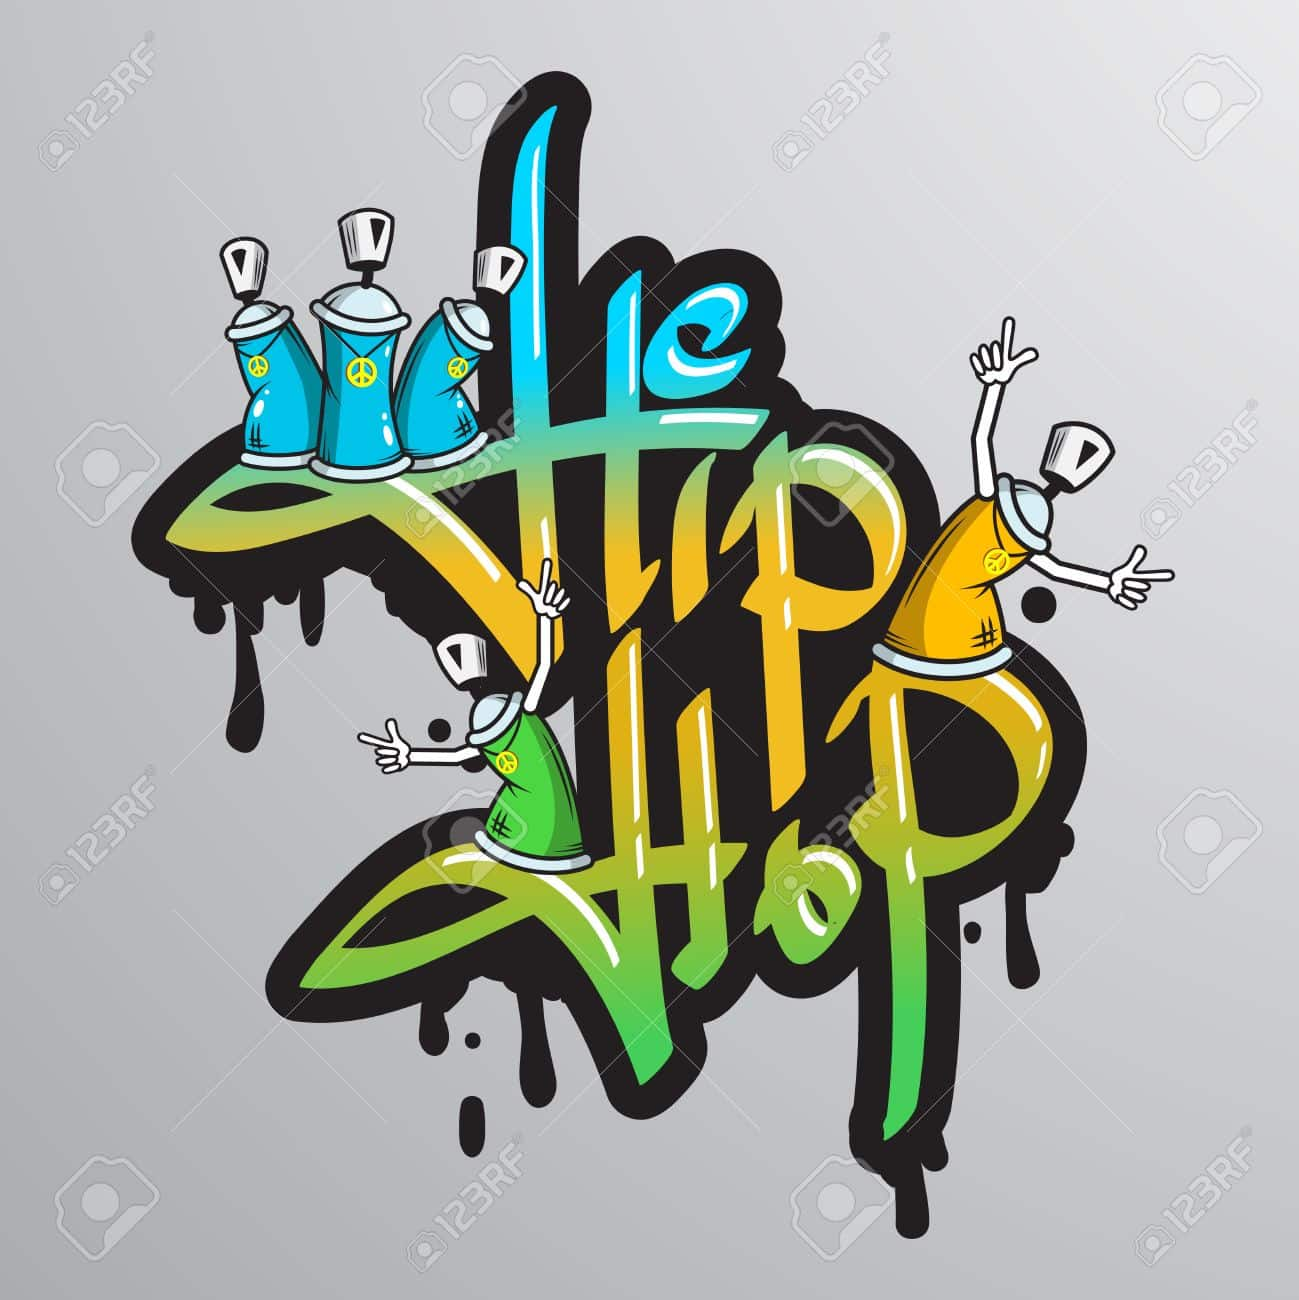 Hip hop album download sites